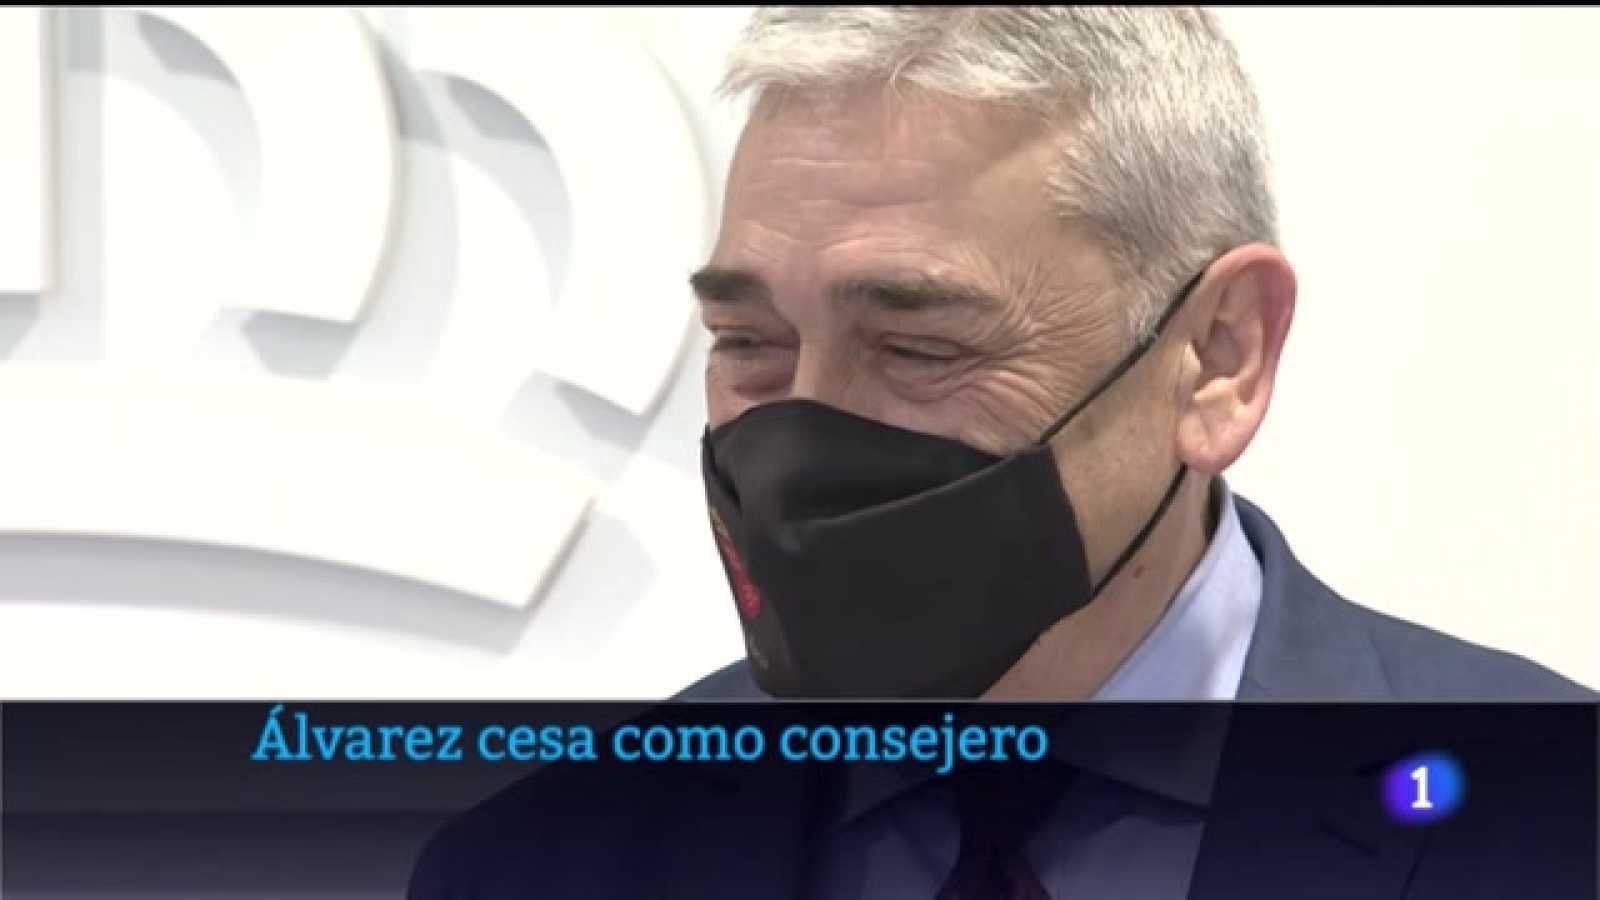 Resumen de Francisco Álvarez como consejero que pasa a ser portavoz en la Asamblea de Murcia